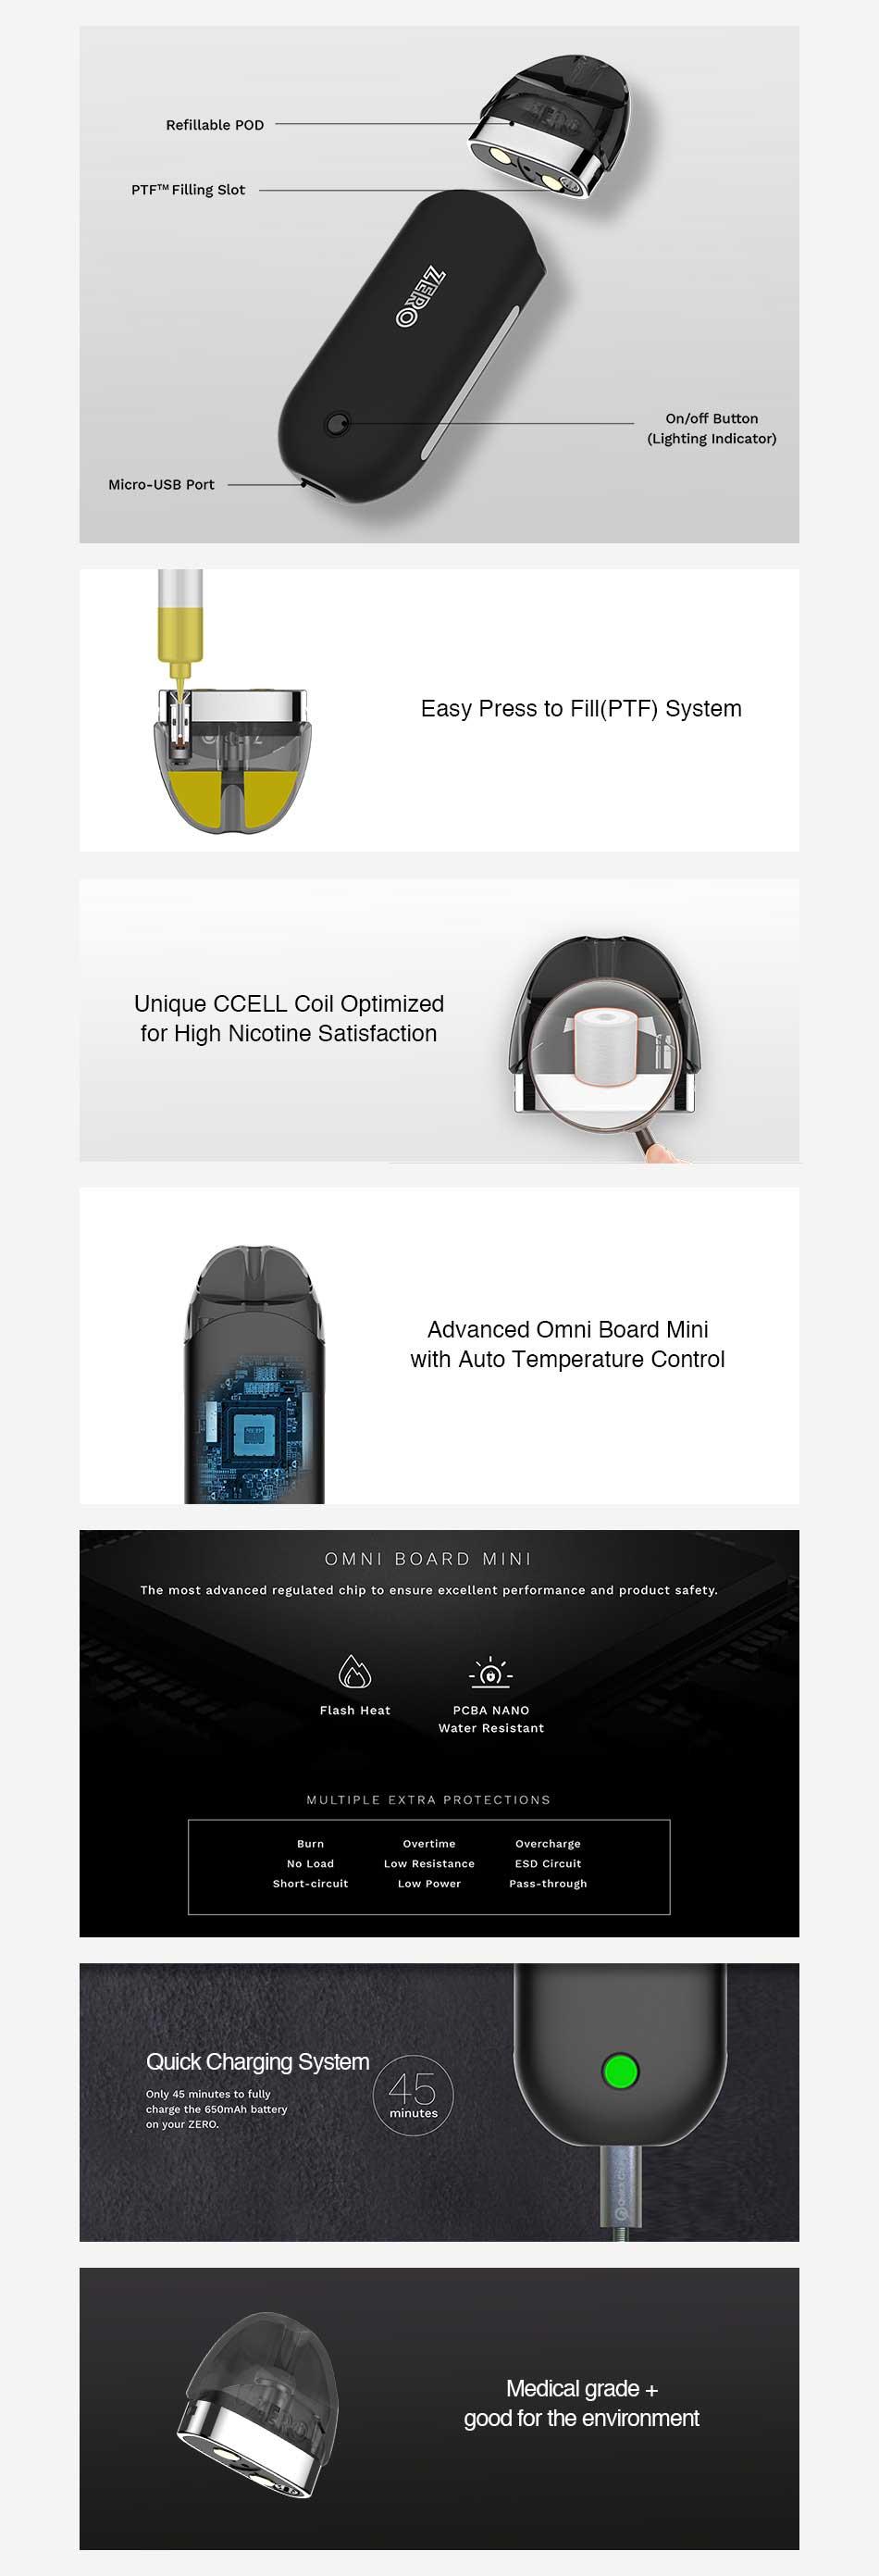 Vaporesso-Renova-Zero-Portable-Pod-Kit-in-Pakistan-For-Sale-VapeStation2